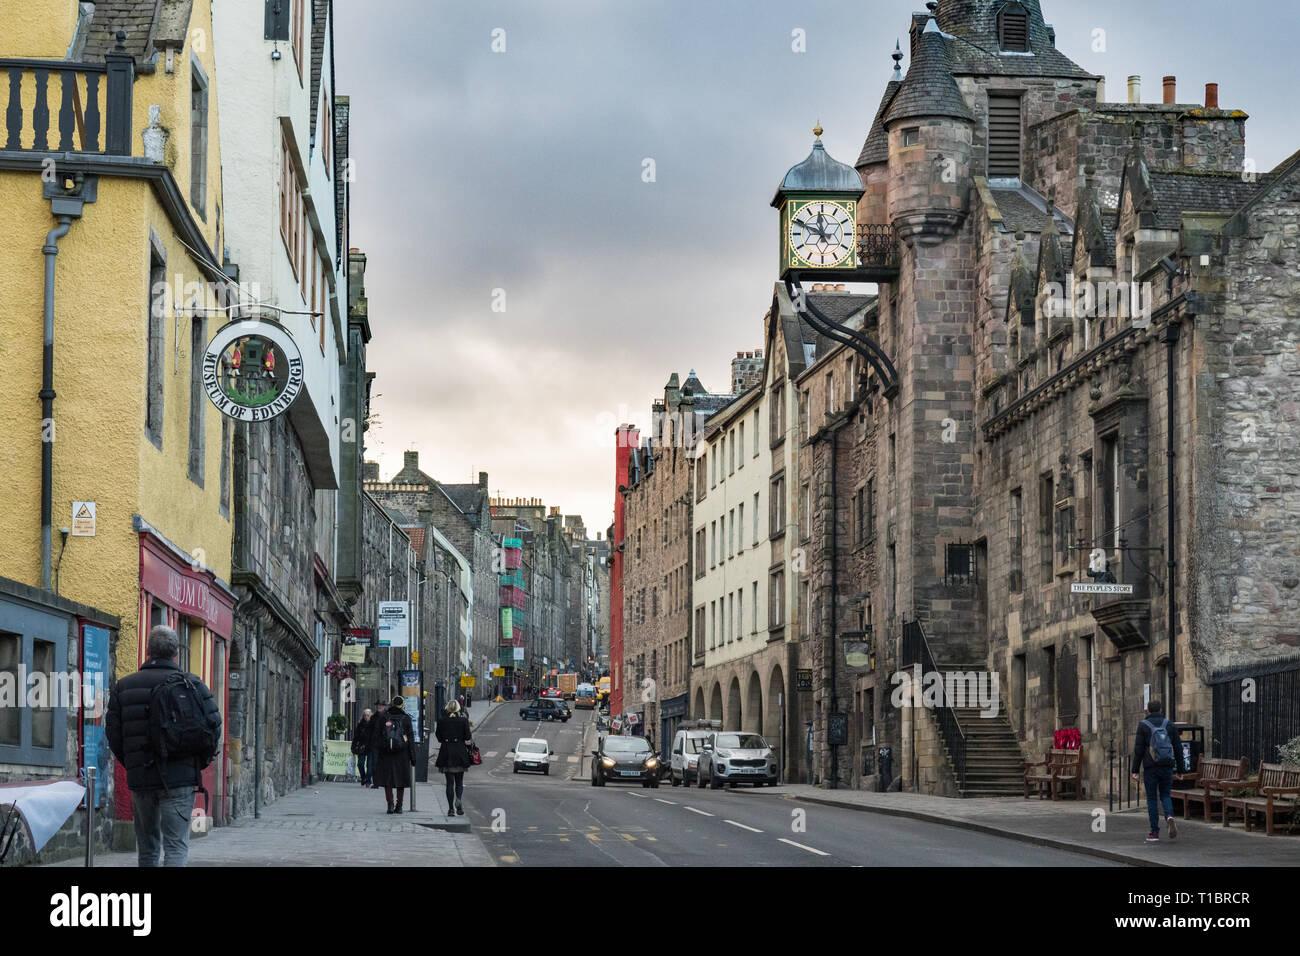 Edinburgh Royal Mile Canongate area, Scotland, UK Stock Photo